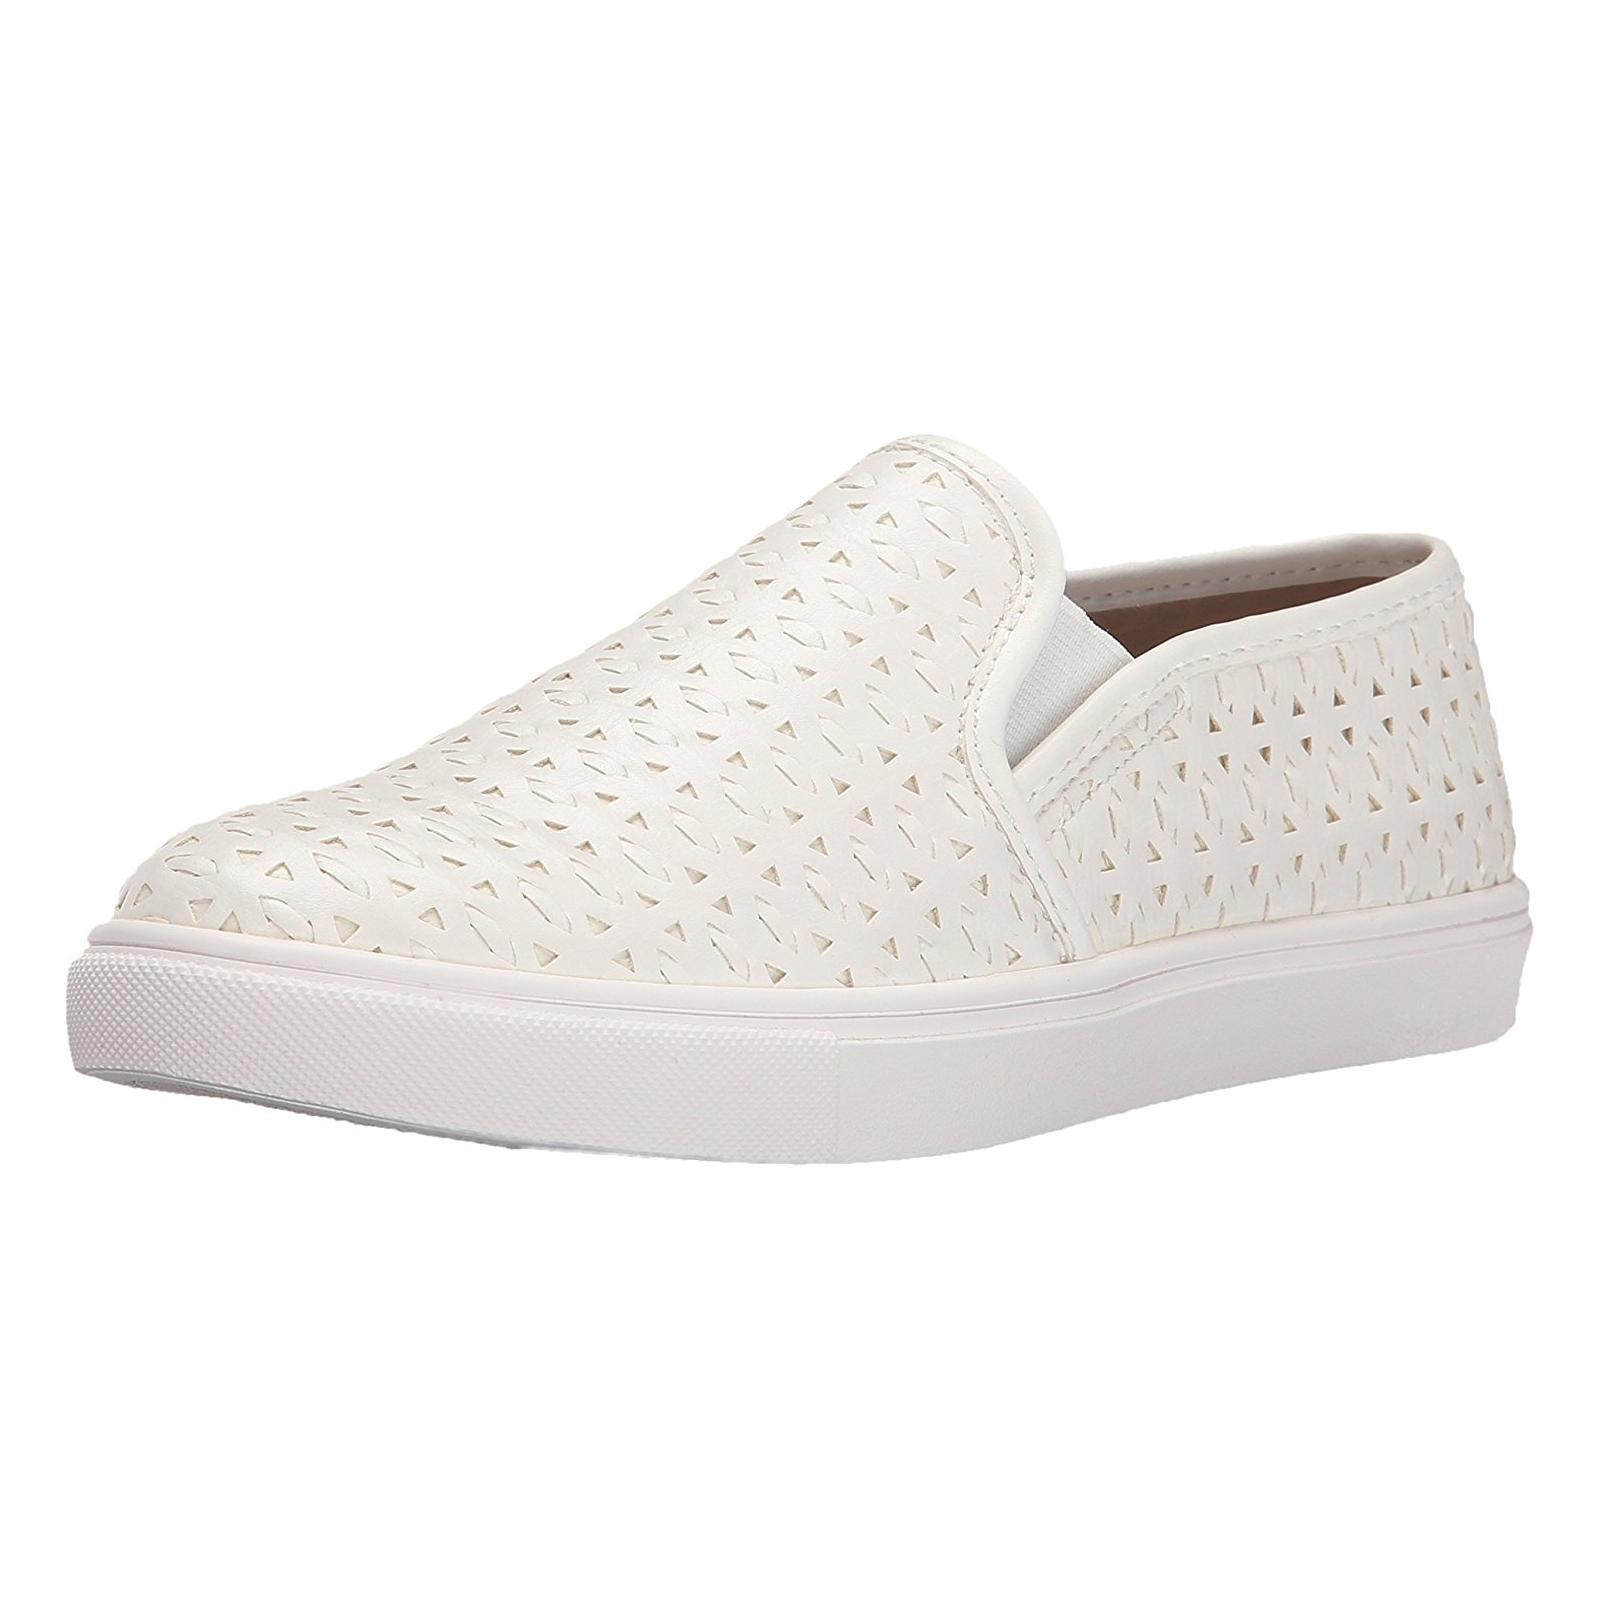 Zapatos promocionales para hombres y mujeres Steve Madden Sneakers Excel White Bianco